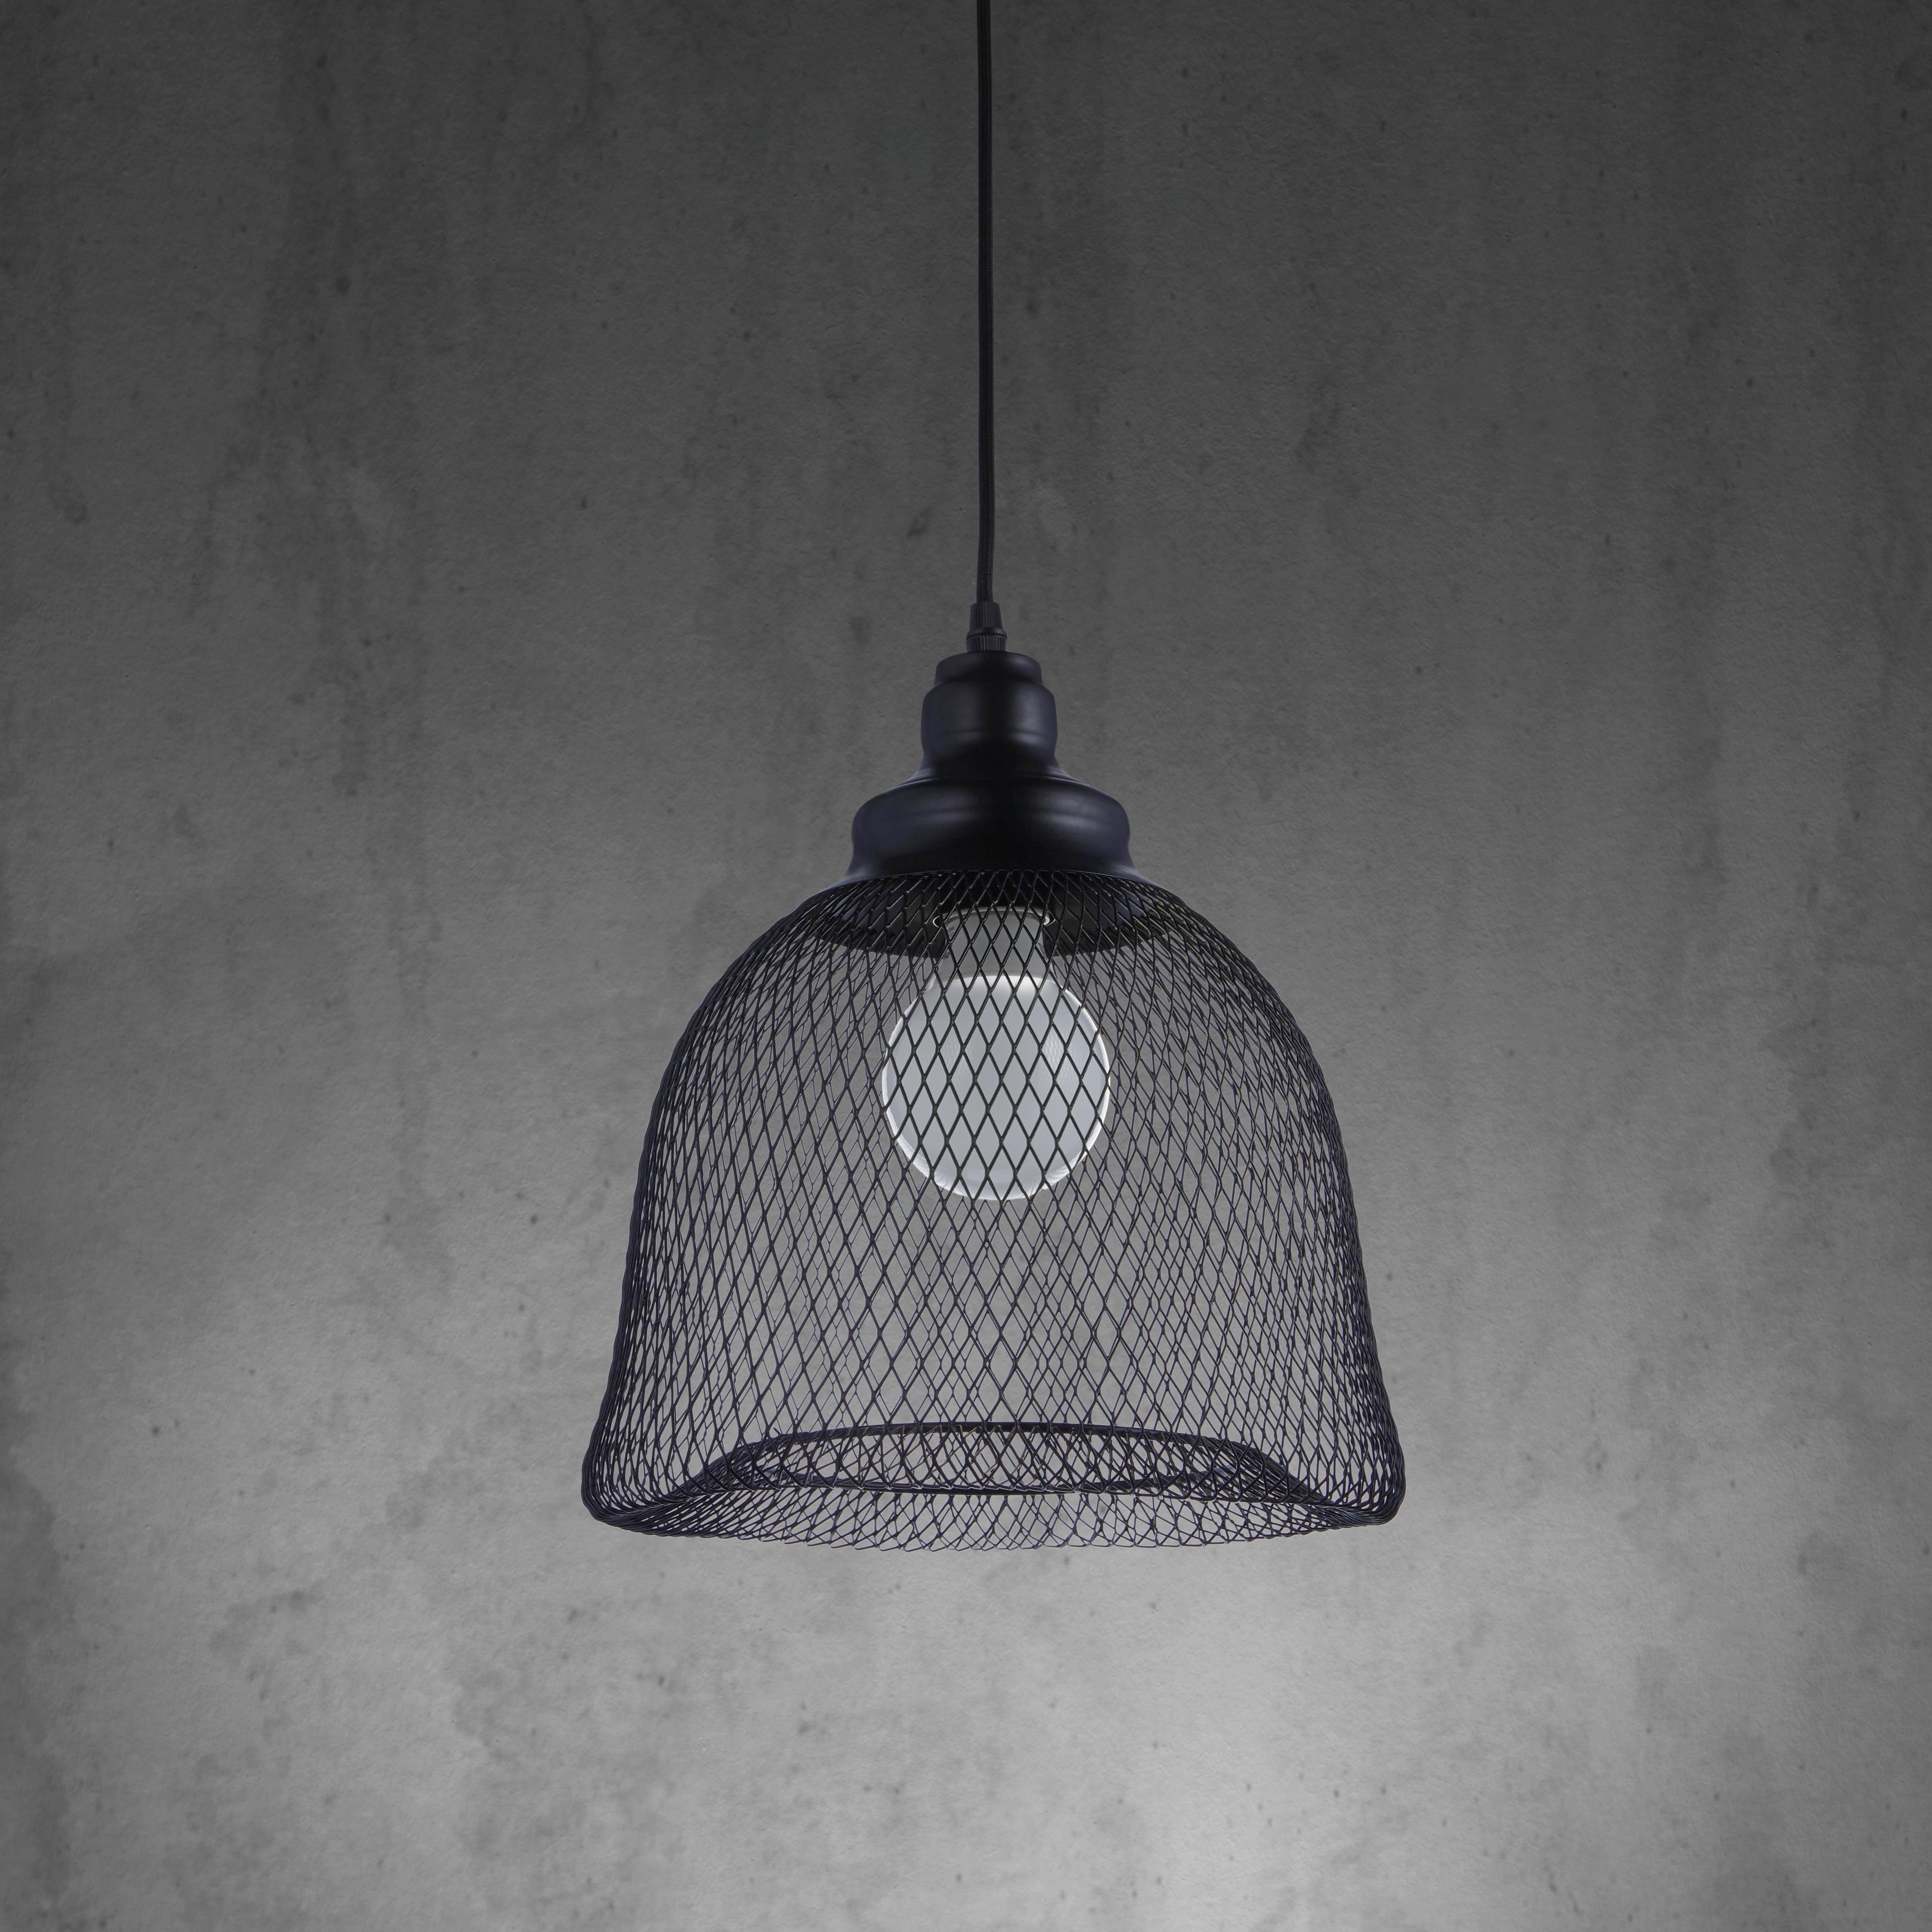 Hängeleuchte Tiaga - Schwarz, MODERN, Metall (29/120cm) - MÖMAX modern living